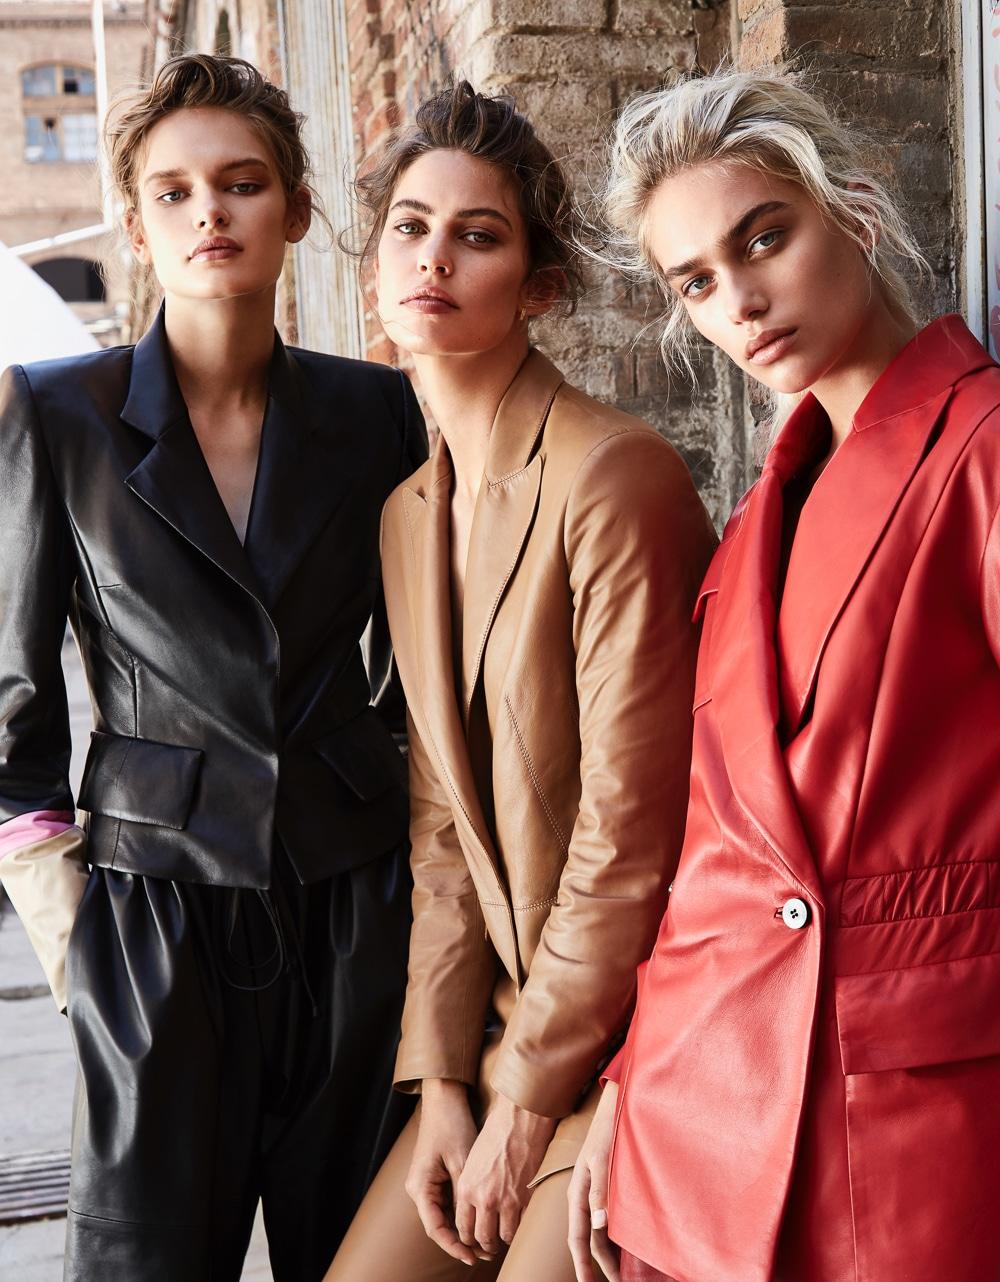 ELLE-Russia-September-2018-Sveta-Danika-Lauren-Rocio-Ramos-5.jpg